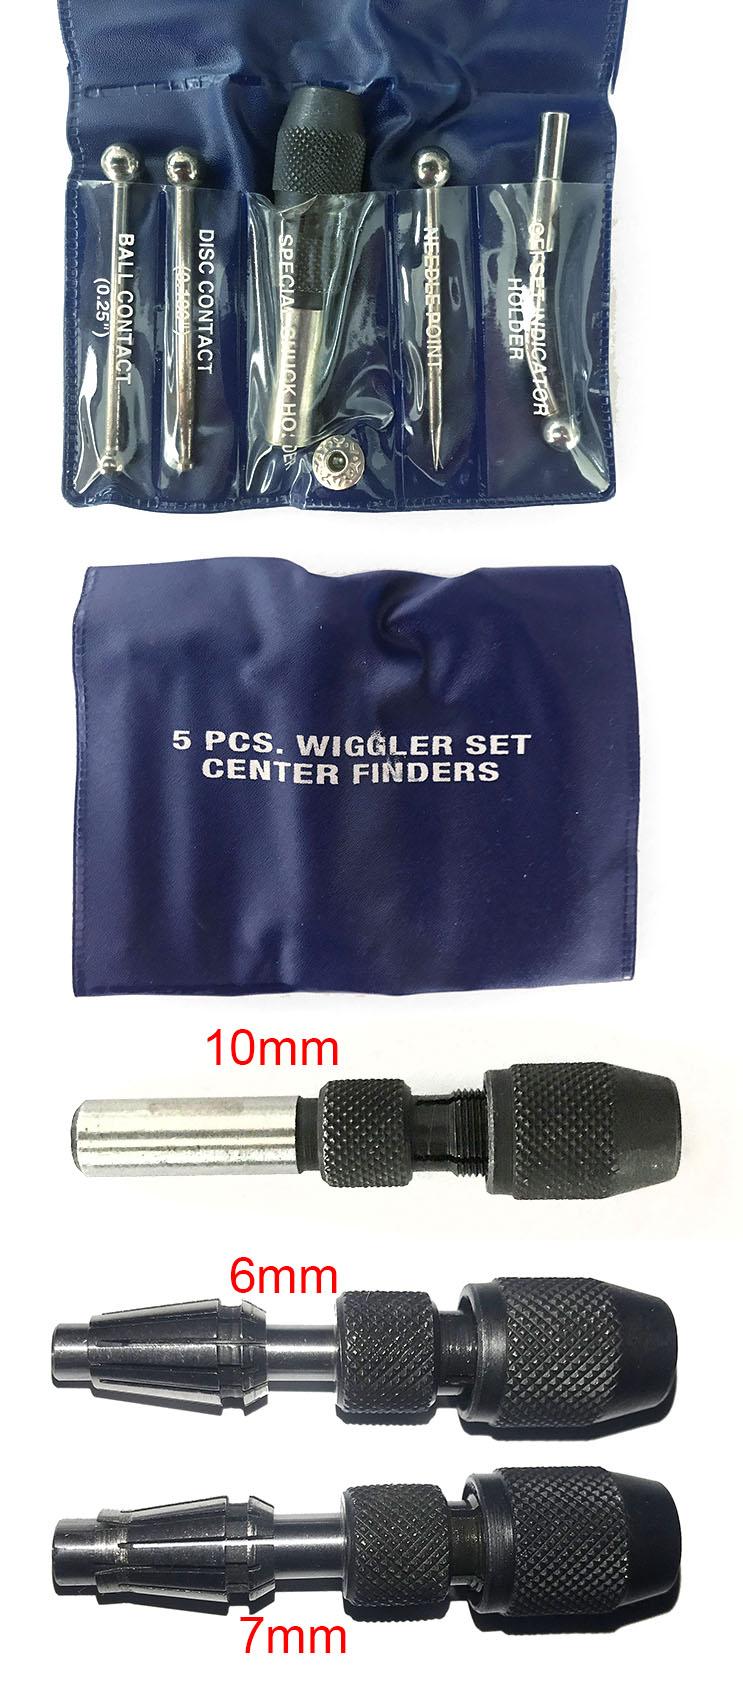 wiggler_set_small